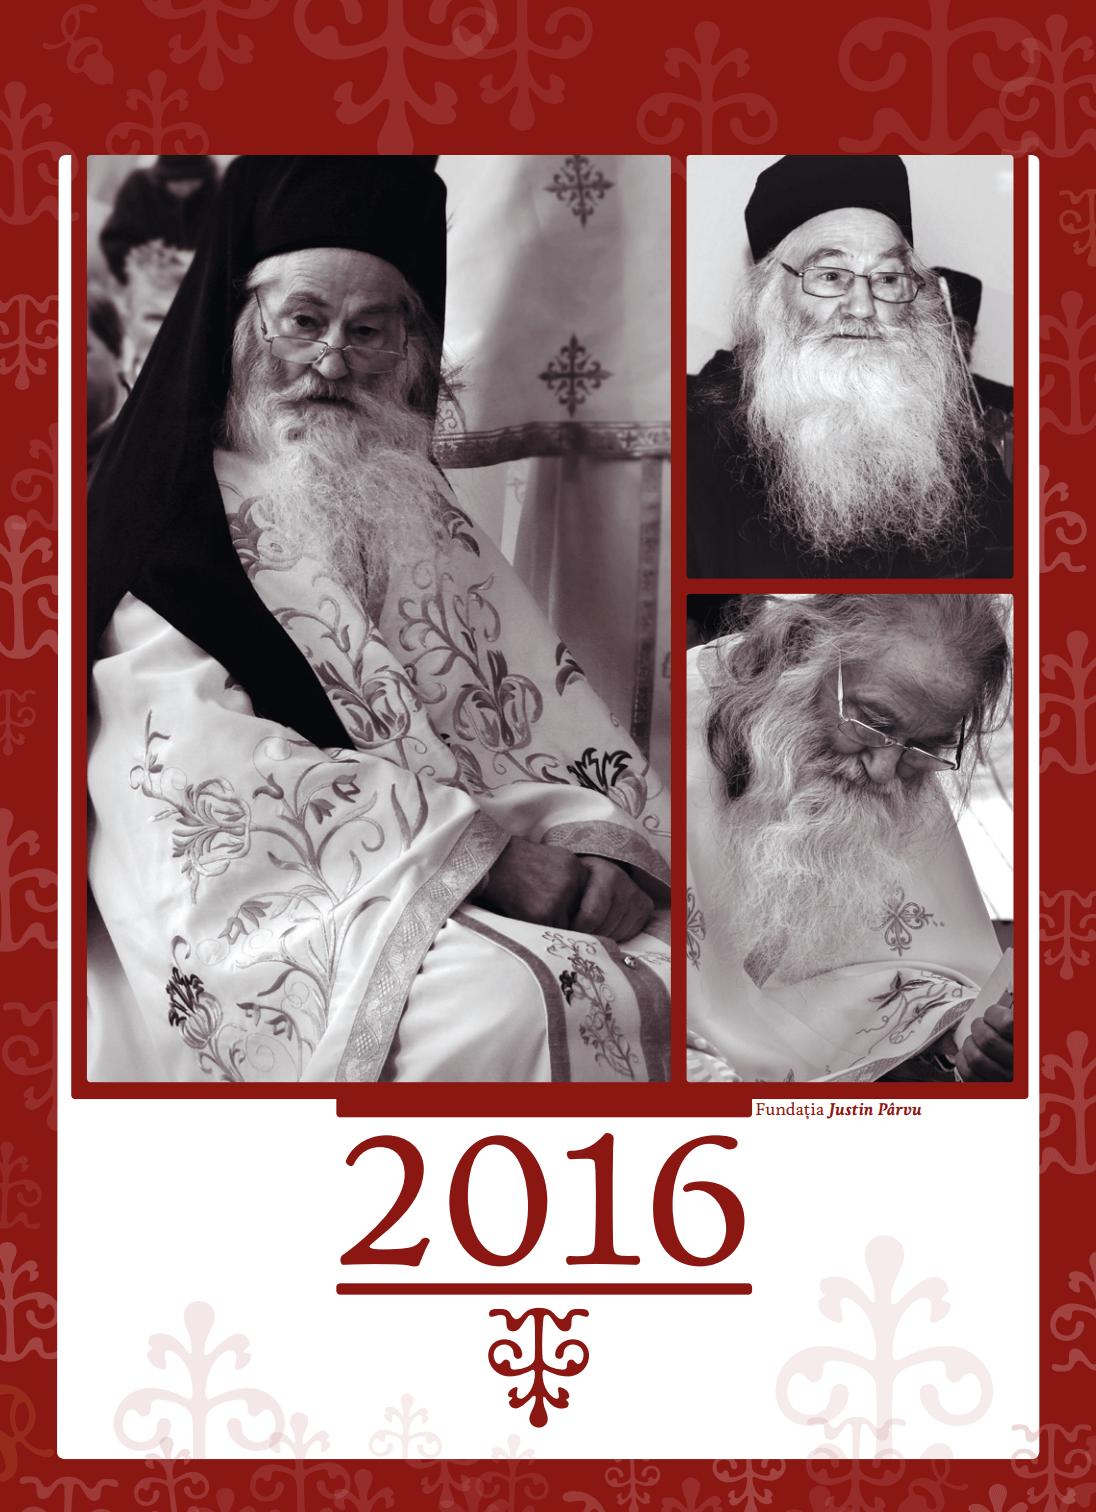 Coperta Calendar 2016 Pr. Justin Parvu